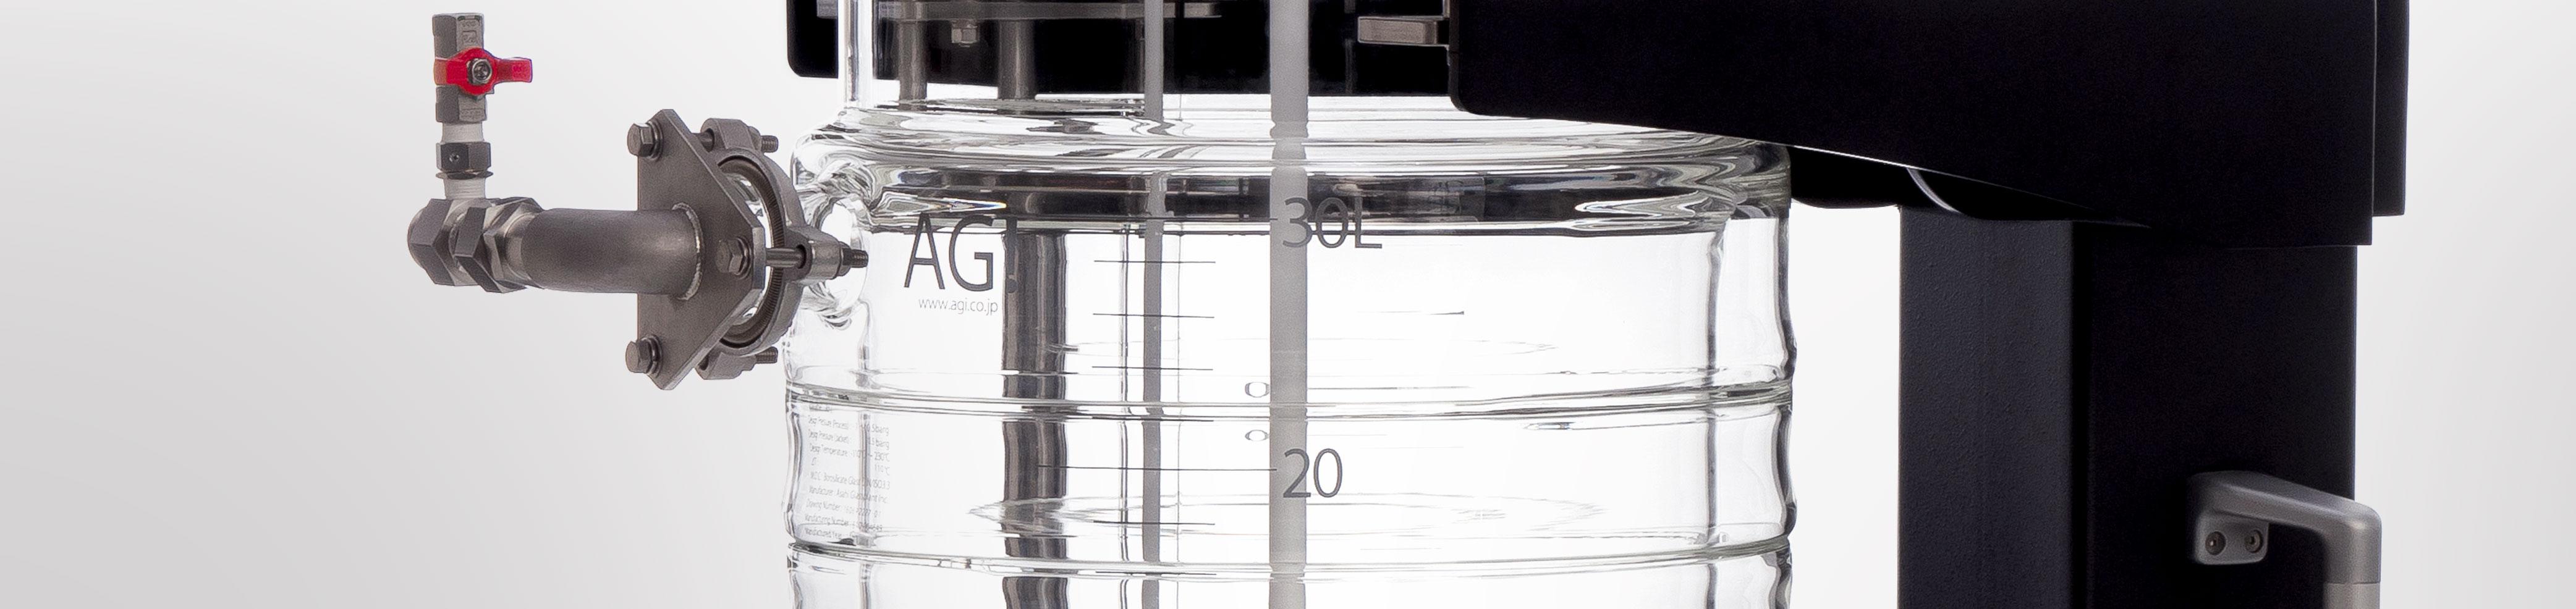 AGI Glassplant Pilot_ Plant Reactor